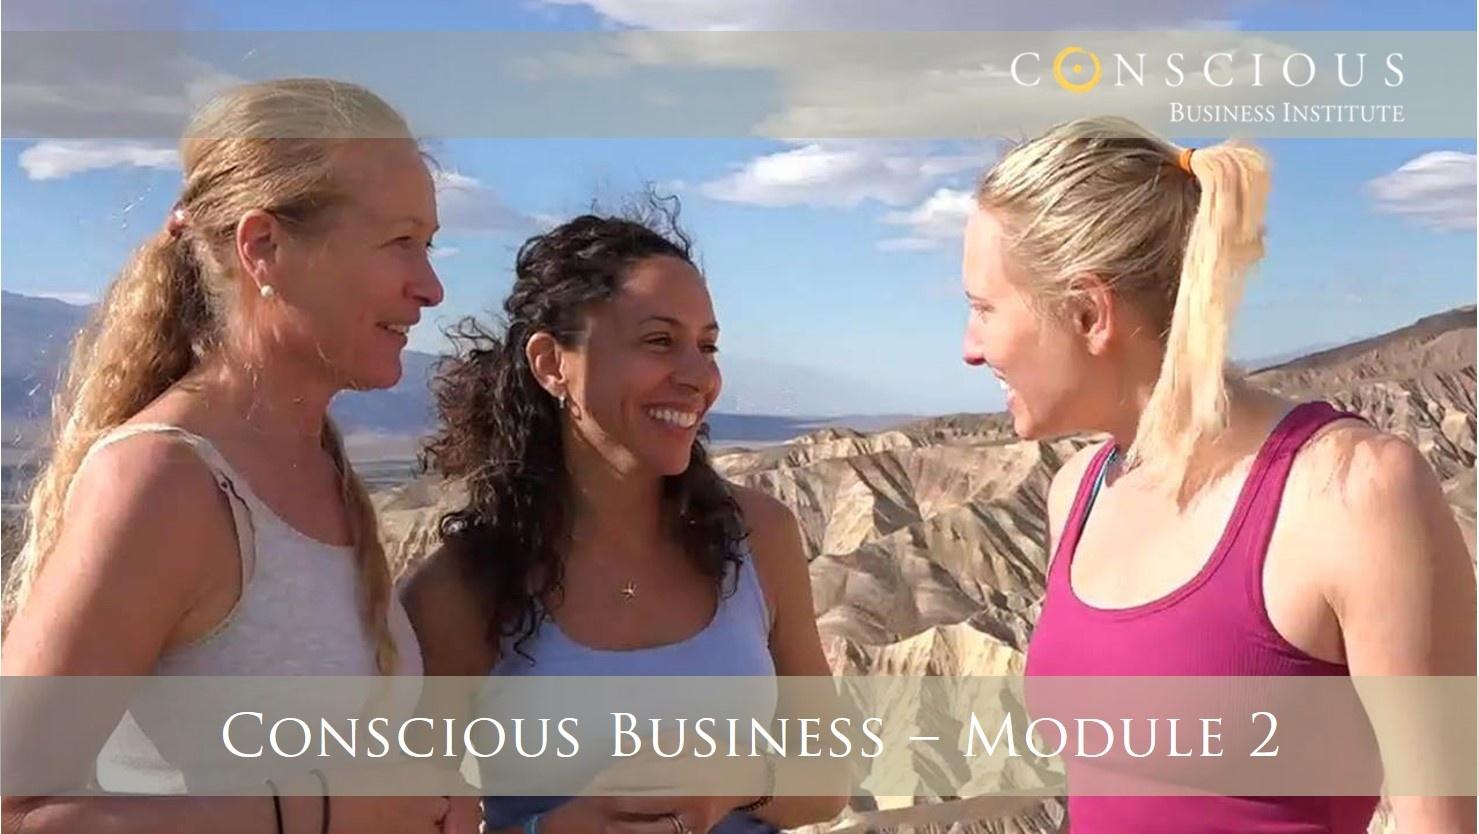 Module 2: Building Relationships & Great Teams